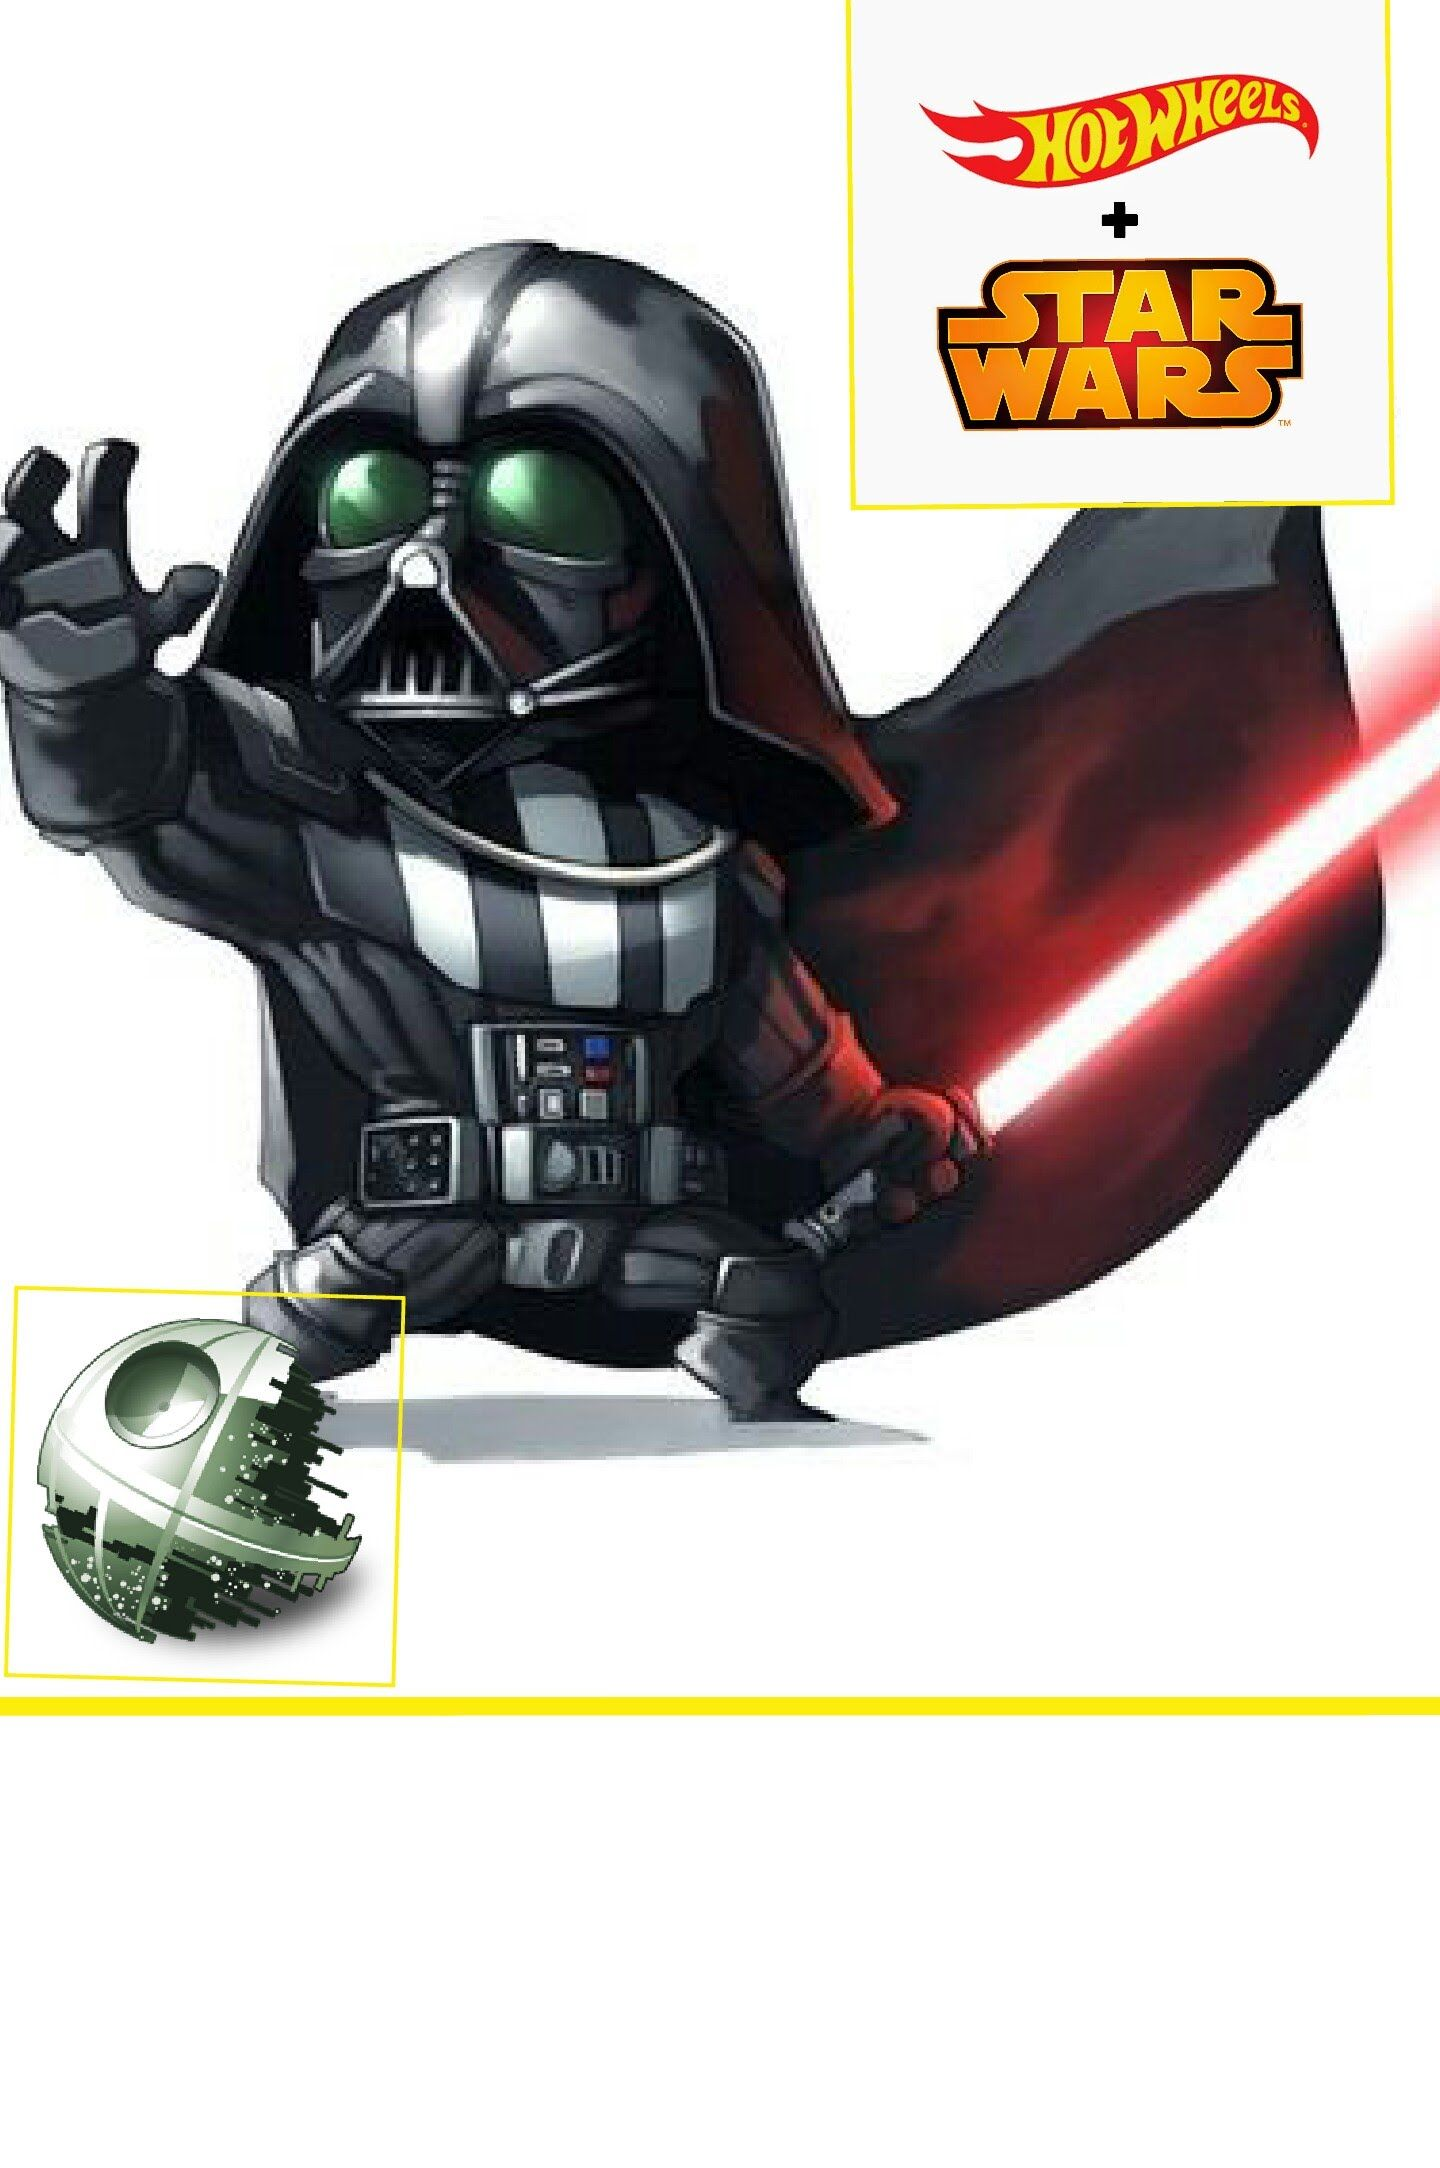 Star Wars Darth Vader Hot Wheels Car